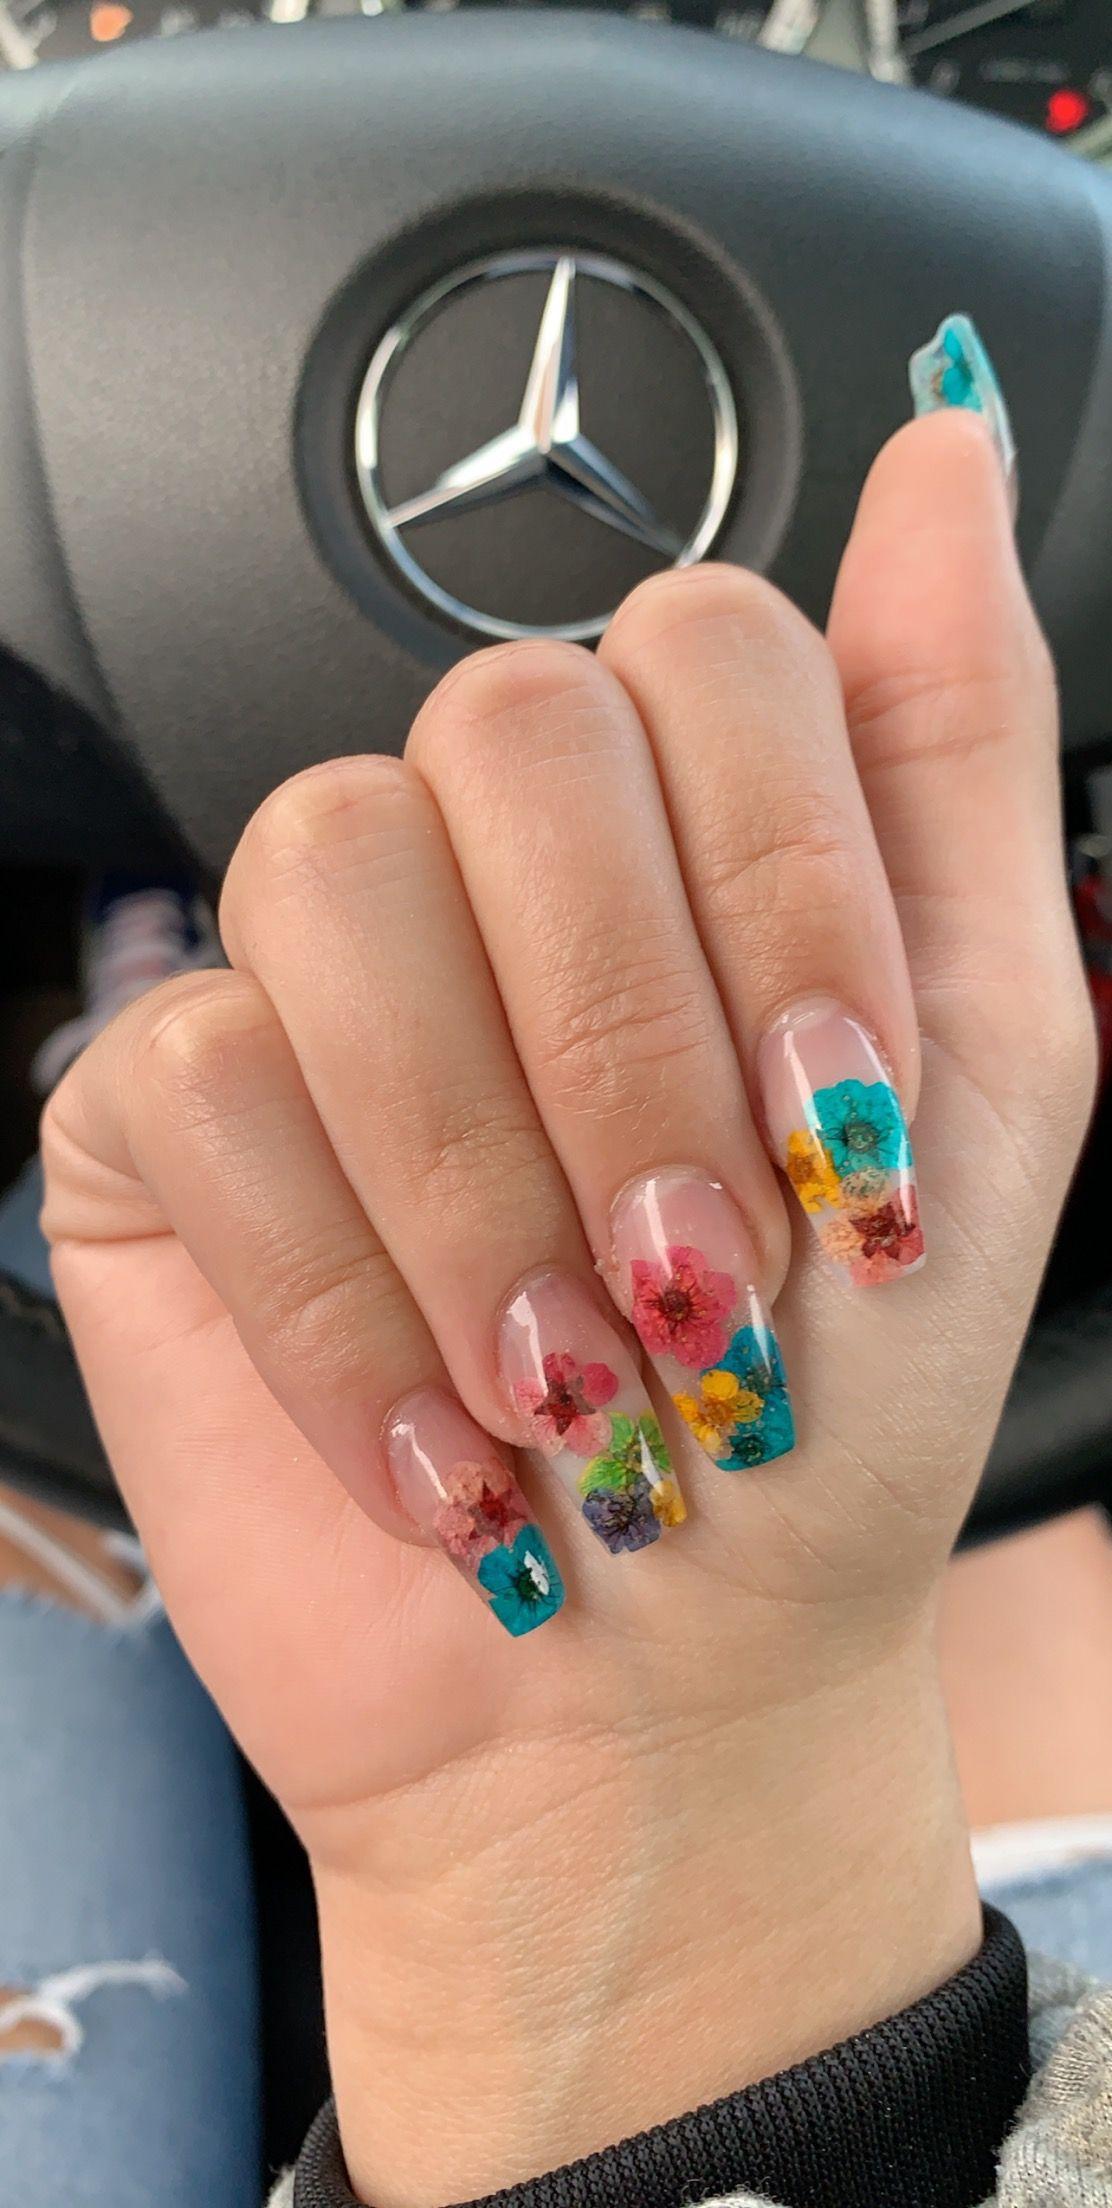 Flower Nails Summer Summernails Flowers Floral Dryflower Encapsulatednails Blue Pink Yellow Acrylic Ac Flower Nails Encapsulated Nails Yellow Nails